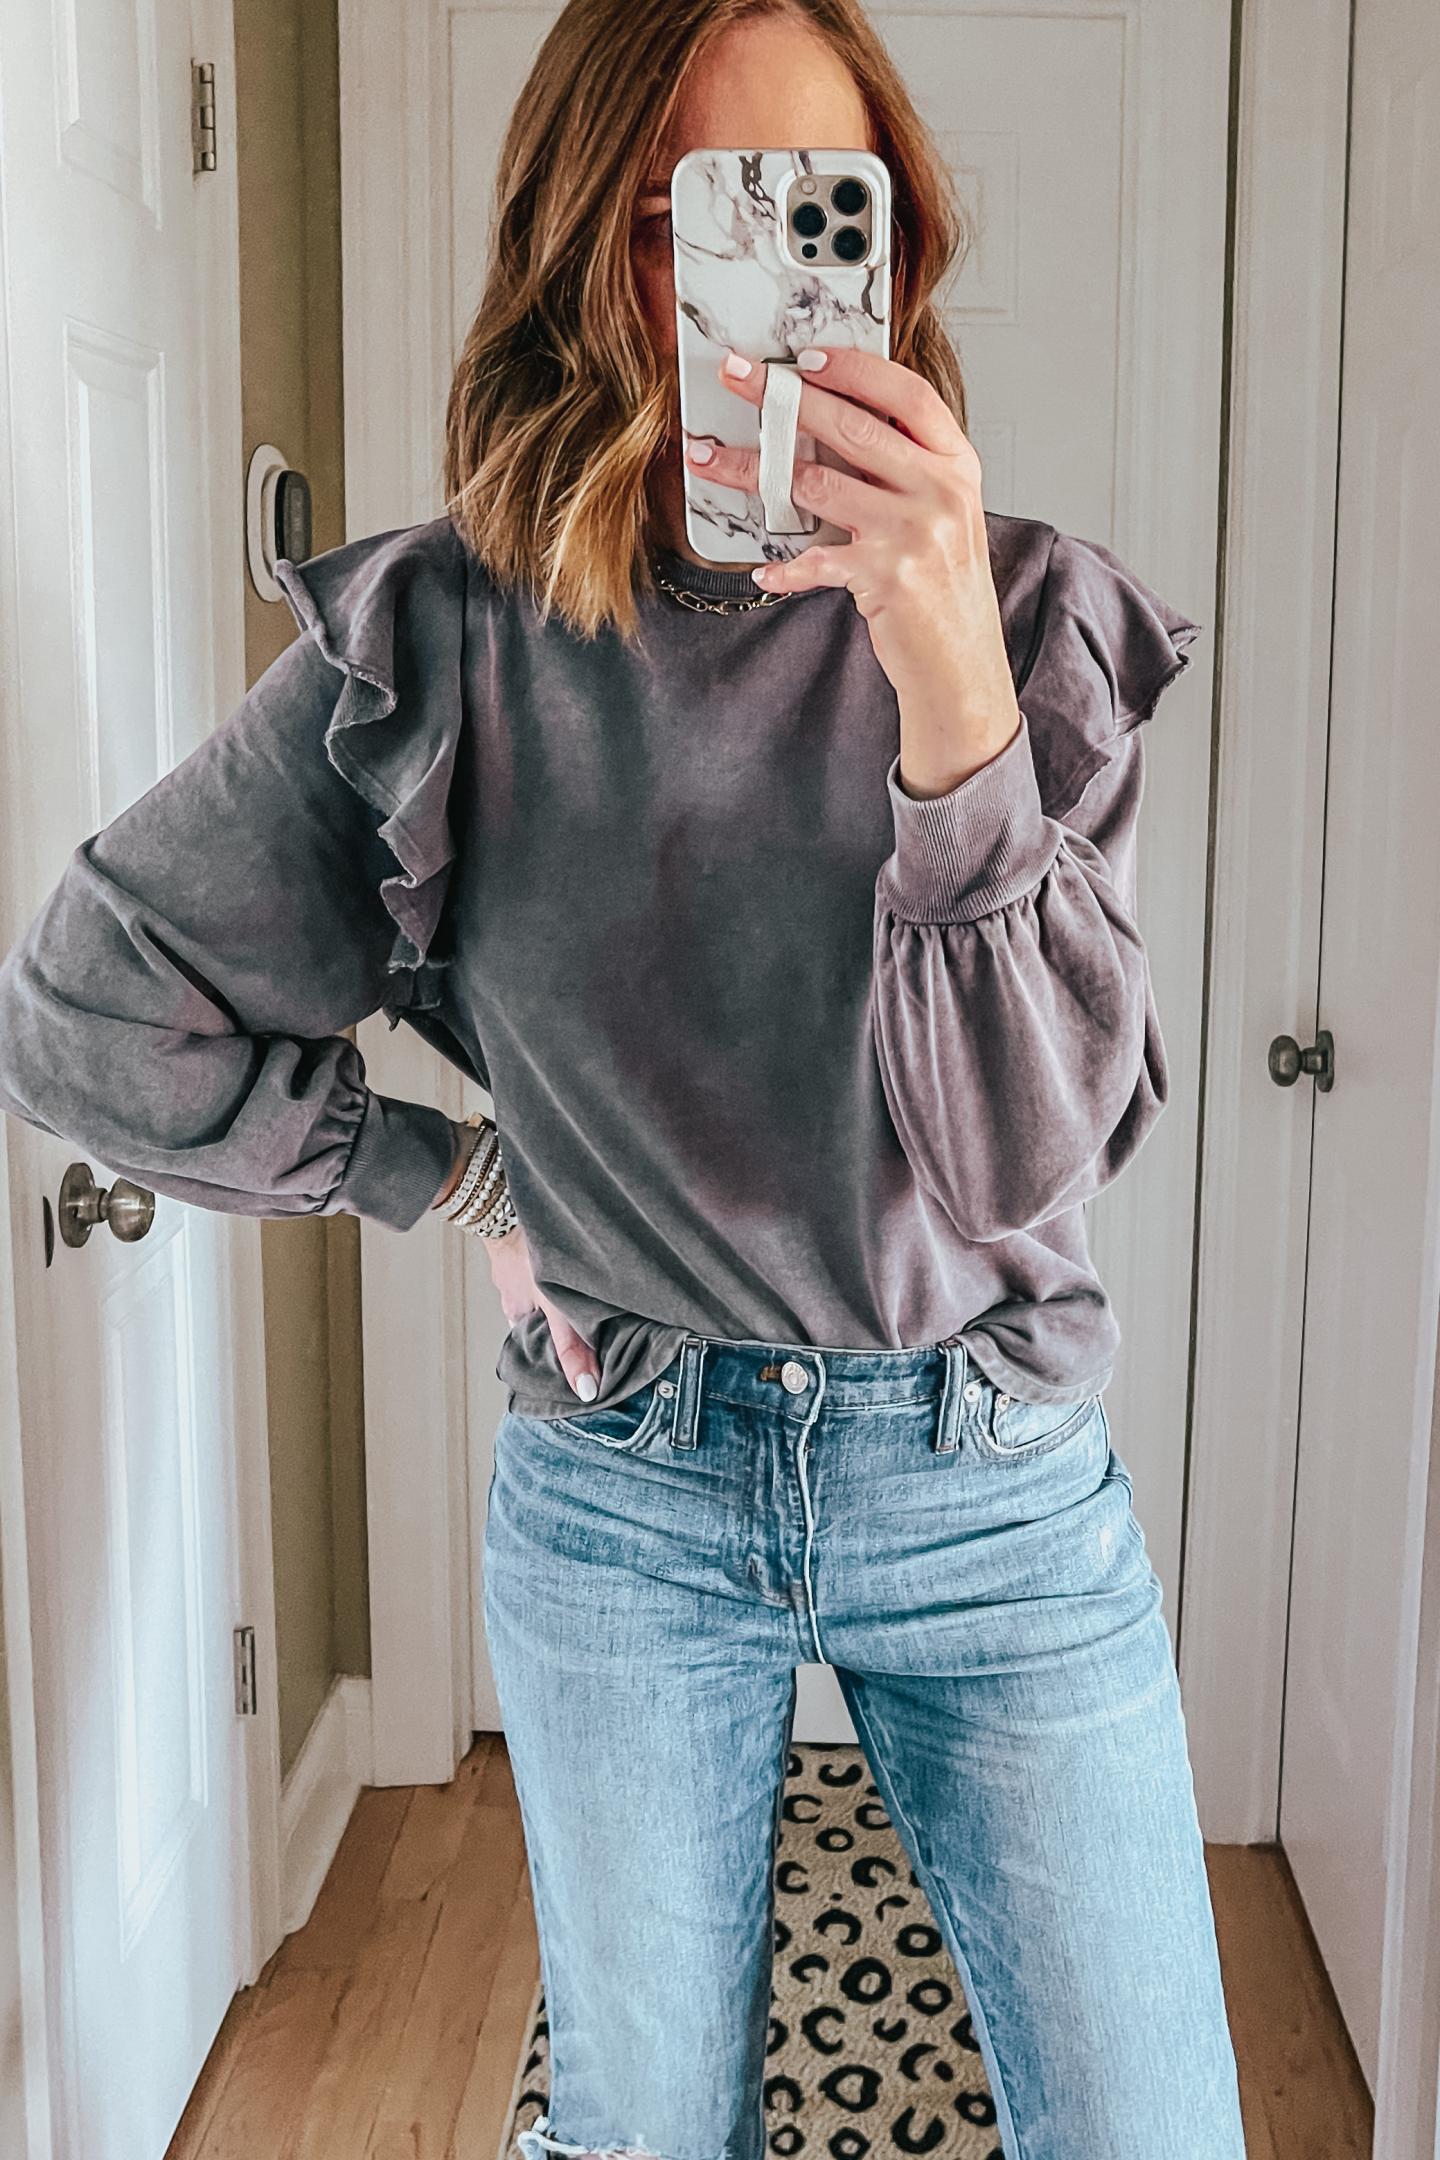 Target Outfits You Need This Winter, acid washed ruffle sweatshirt, grey ruffle sweatshirt